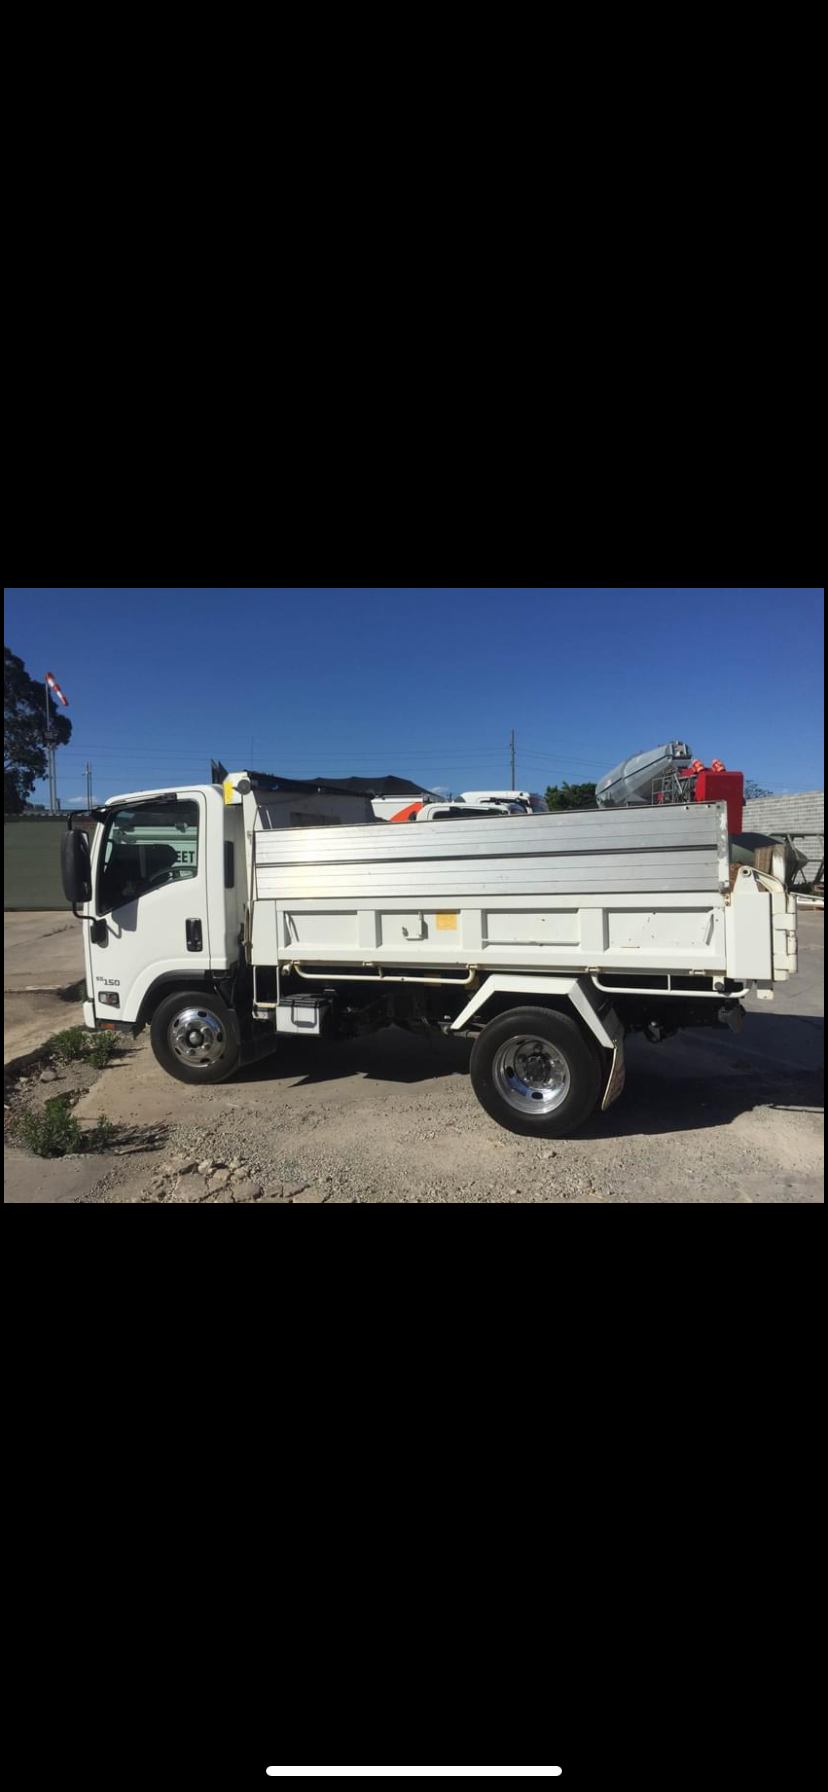 Hire 3t tipper truck